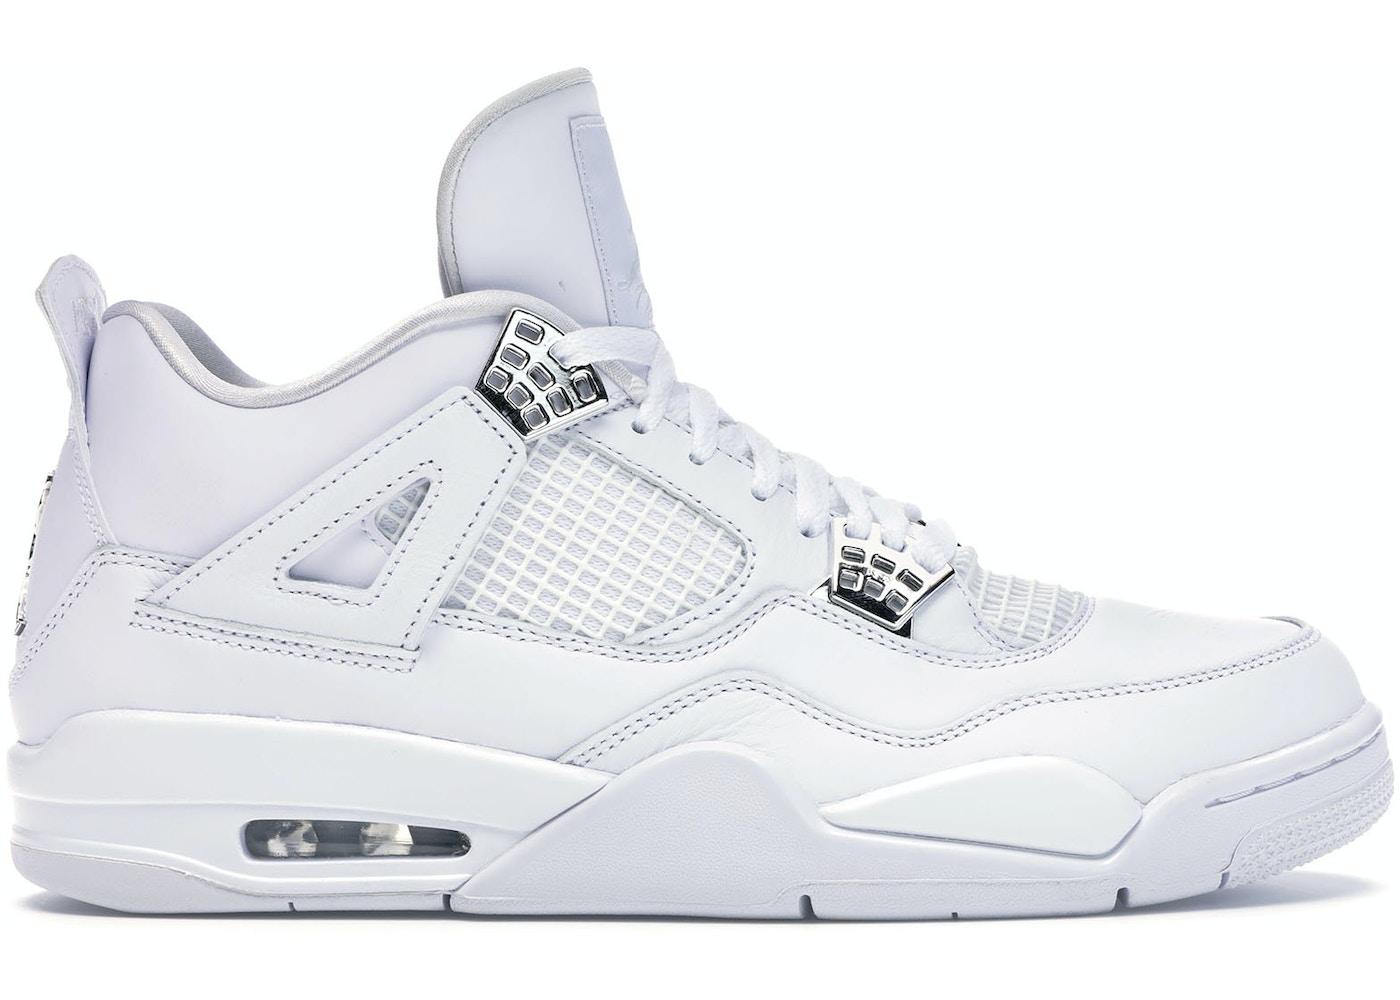 online store e60c4 e58a3 Buy Air Jordan 4 Shoes   Deadstock Sneakers